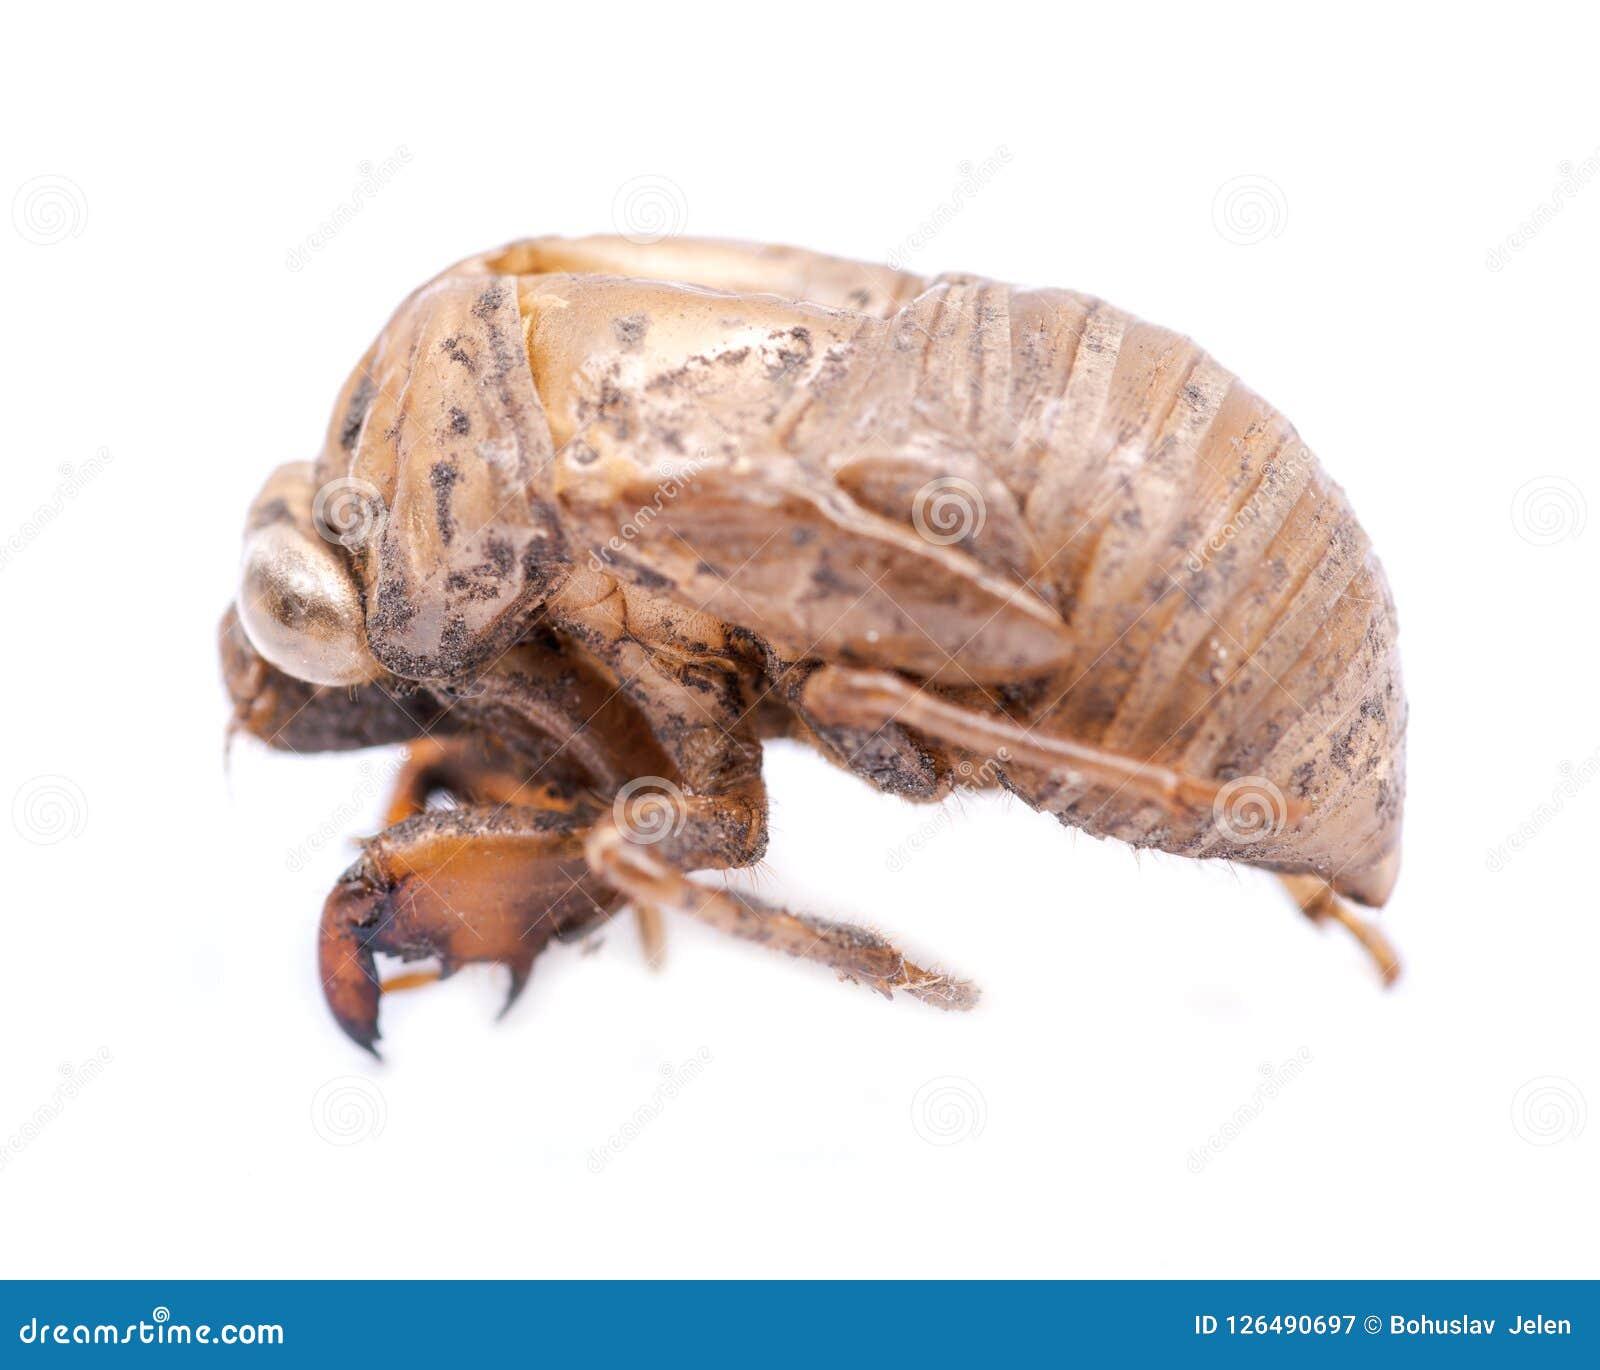 Shell van de cicadenimf exuvum Periodieke cicadetotstandkoming Exoskeleton van metamorfosenimfen Larve Ha